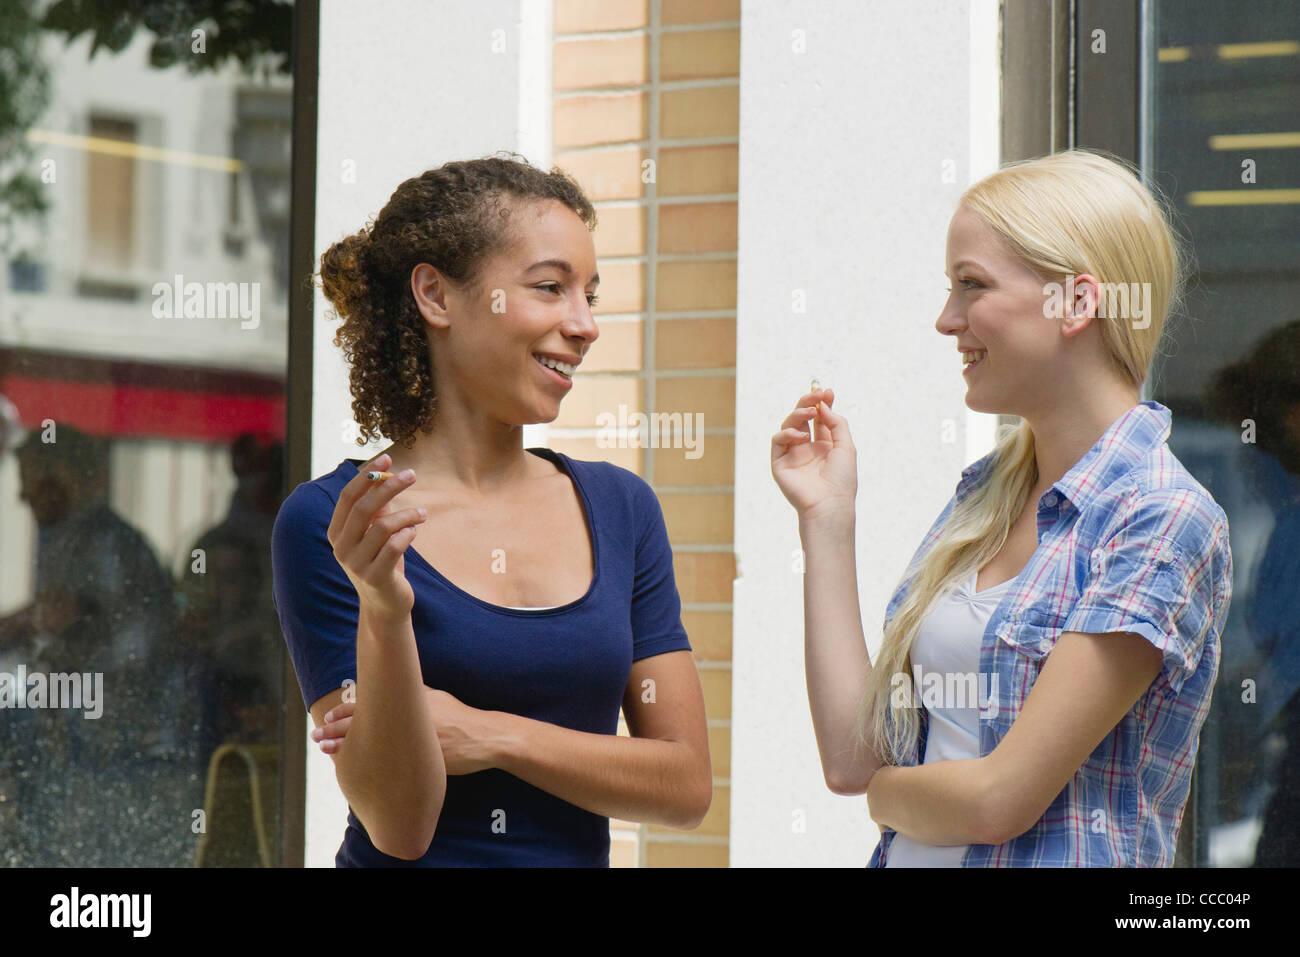 Young women taking cigarette break - Stock Image